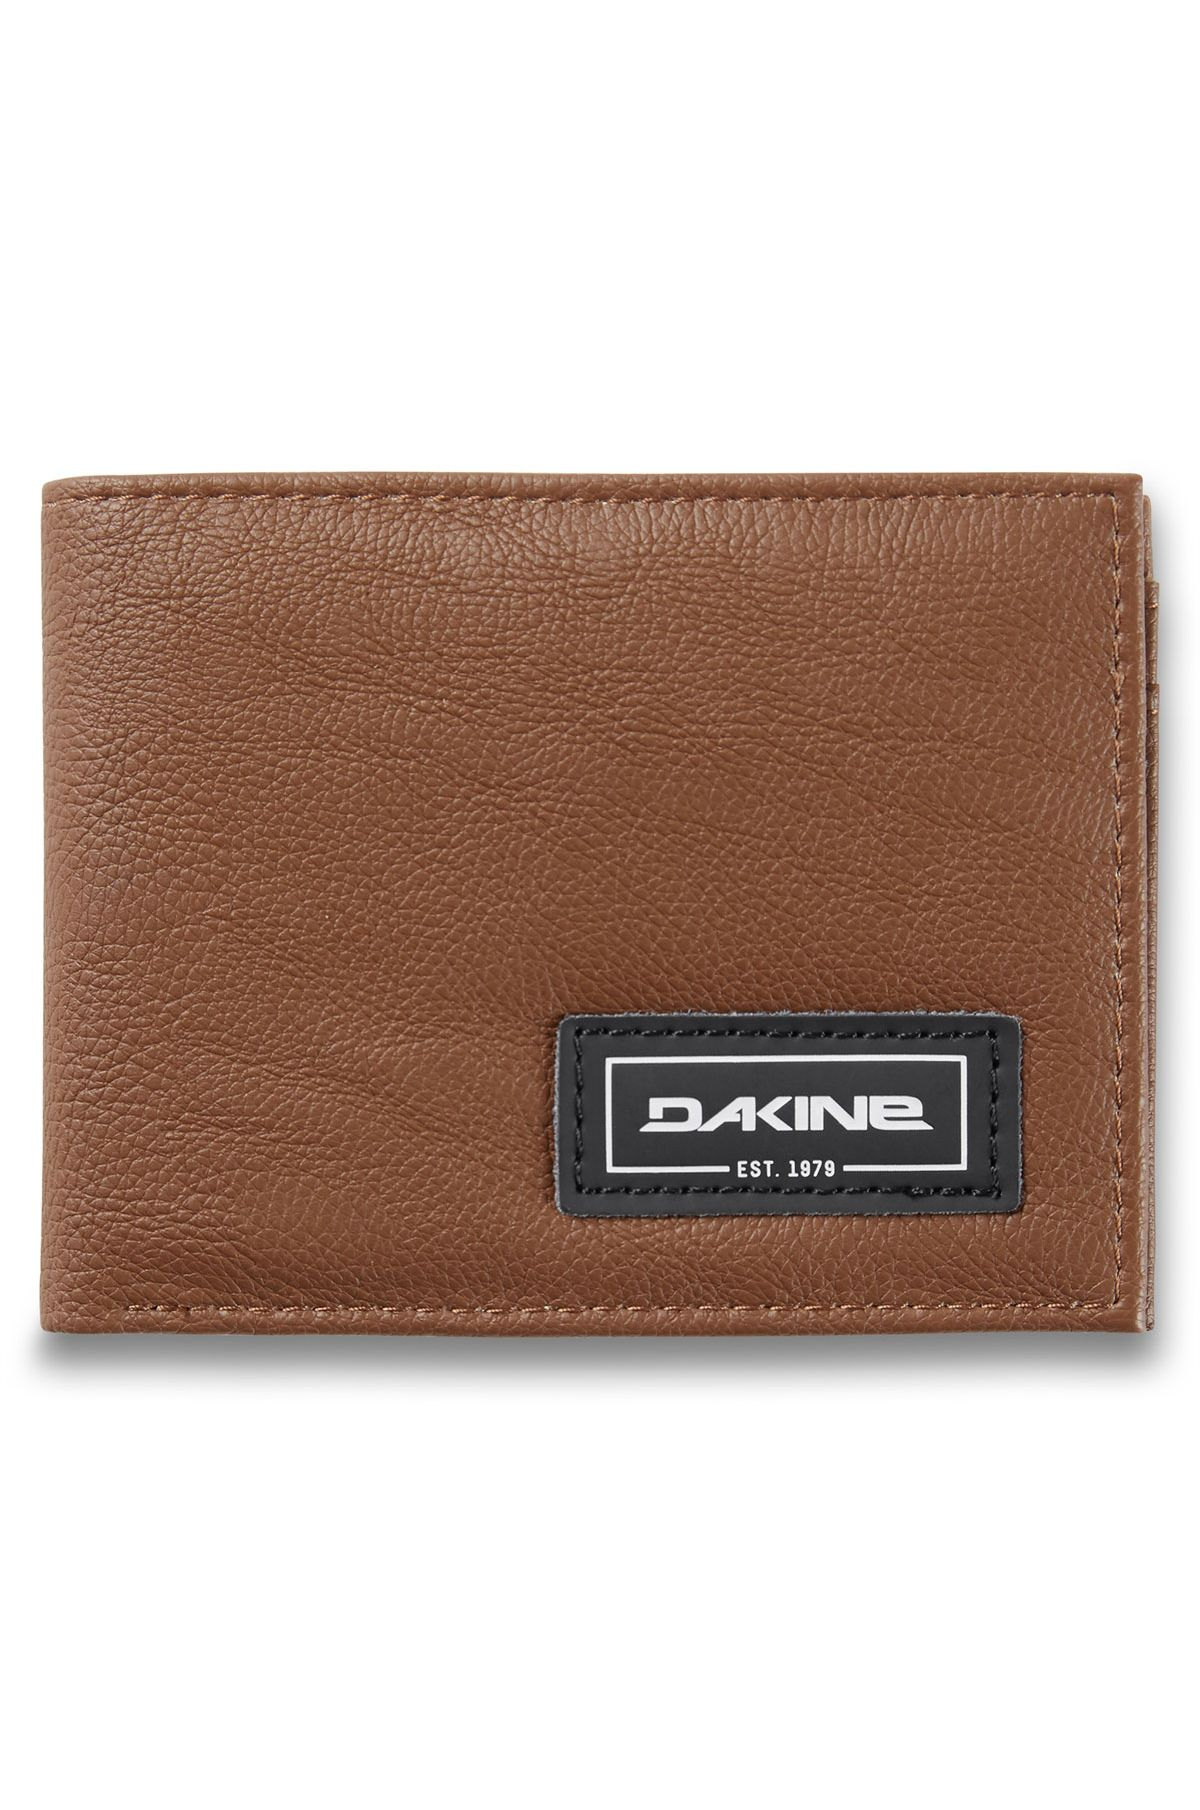 Dakine Wallet RIGGS Brown